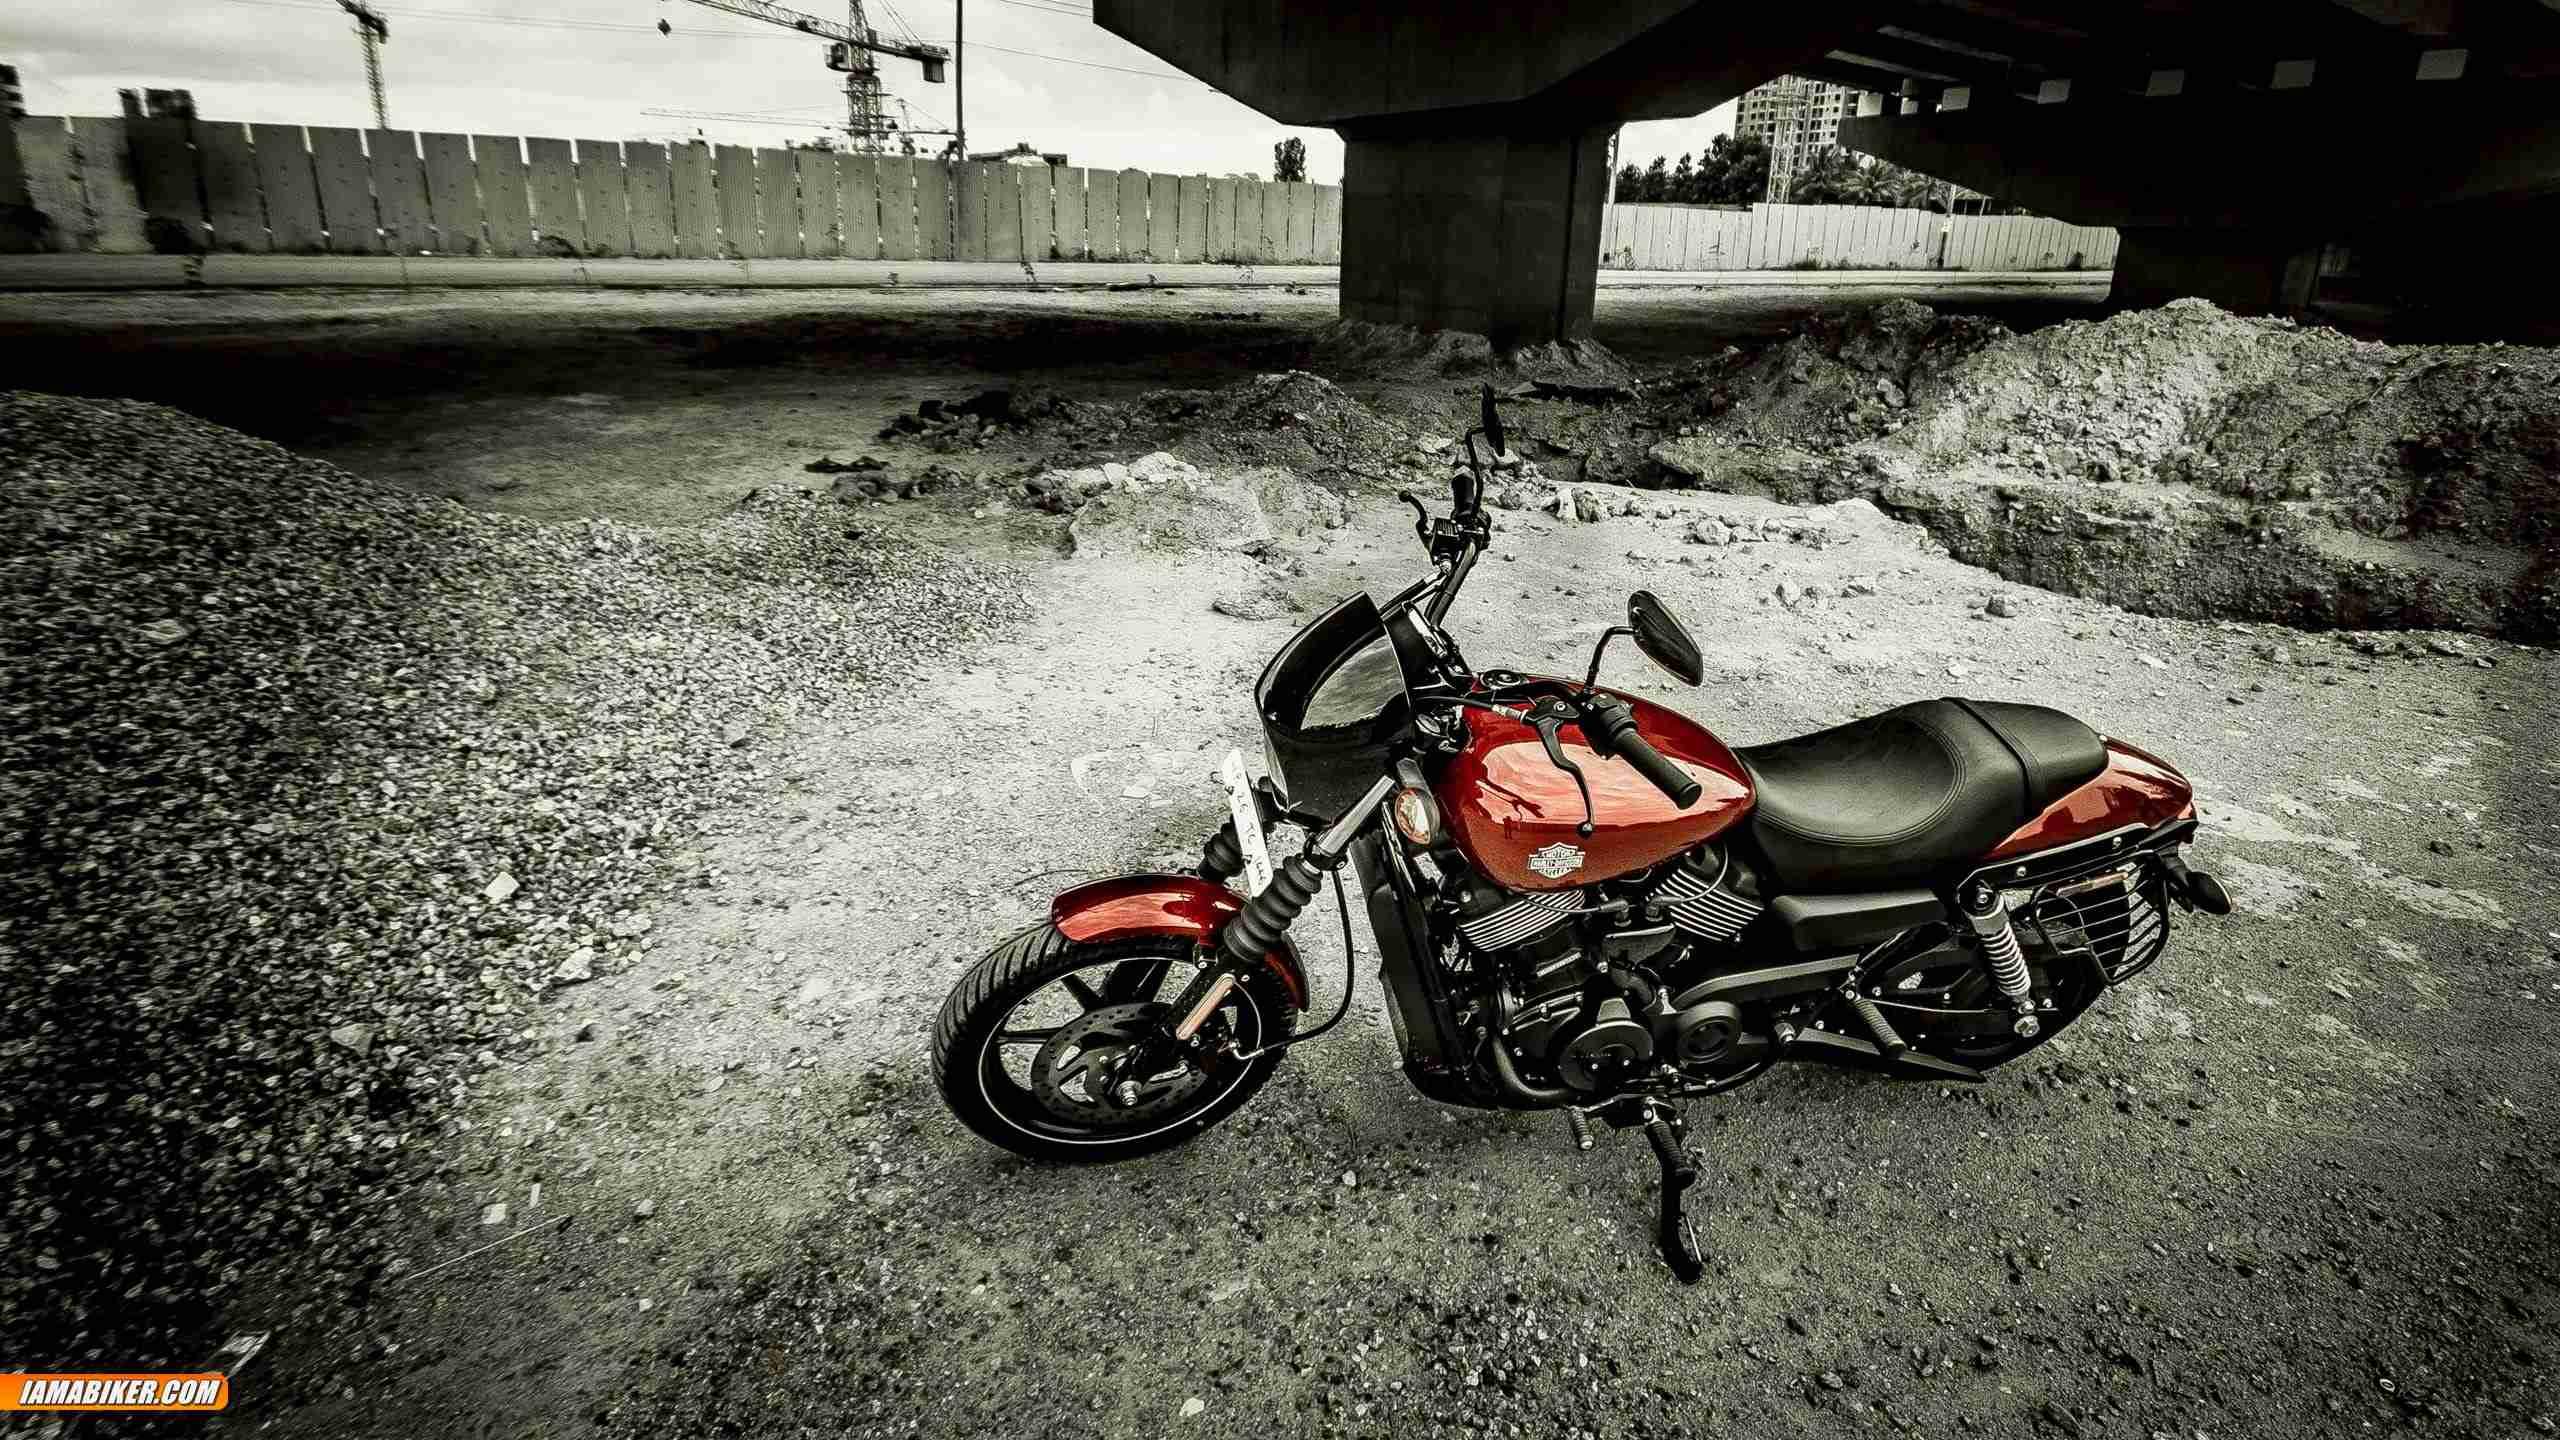 Harley Davidson Street 750 HD wallpaper